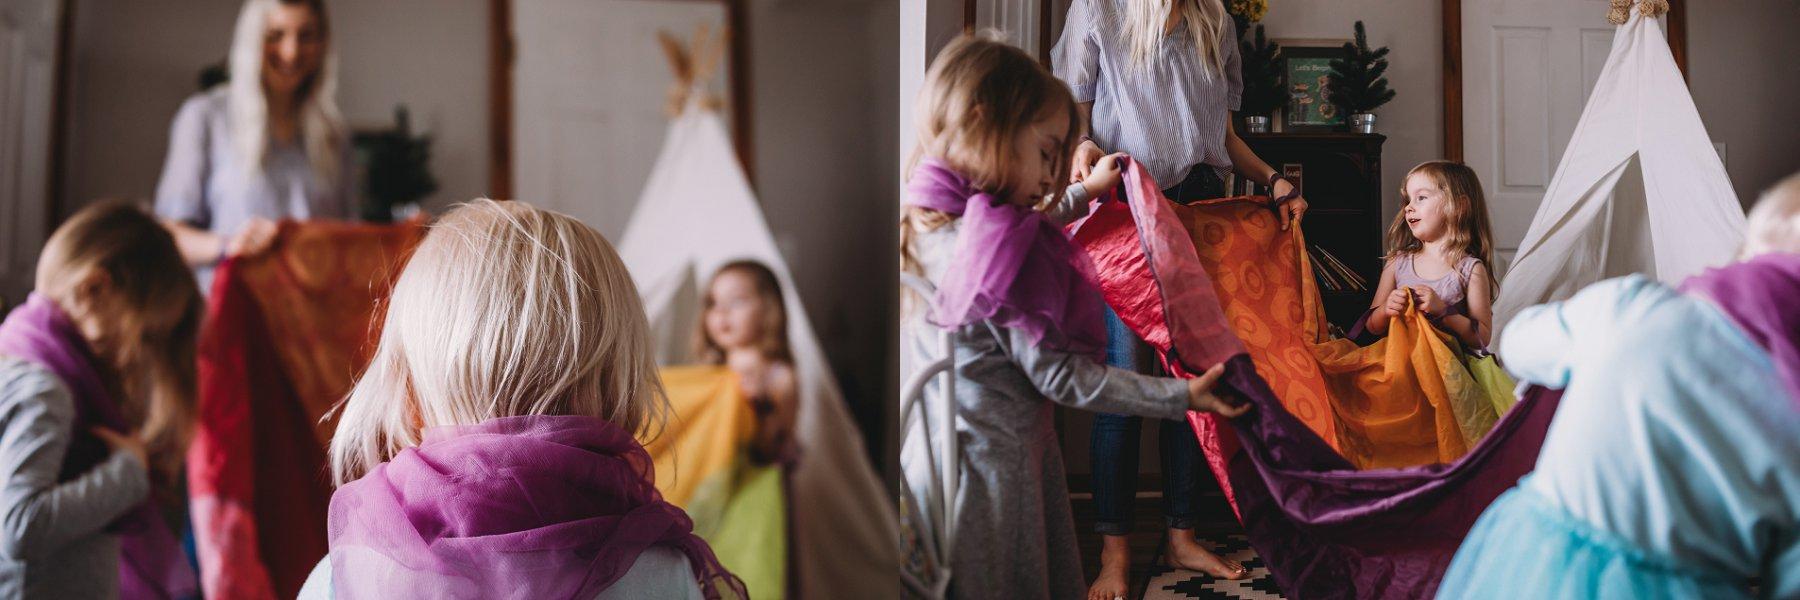 Documentary Lifestyle Motherhood Photography in Kansas City by Merry Ohler | Family Photographer Kansas City 10